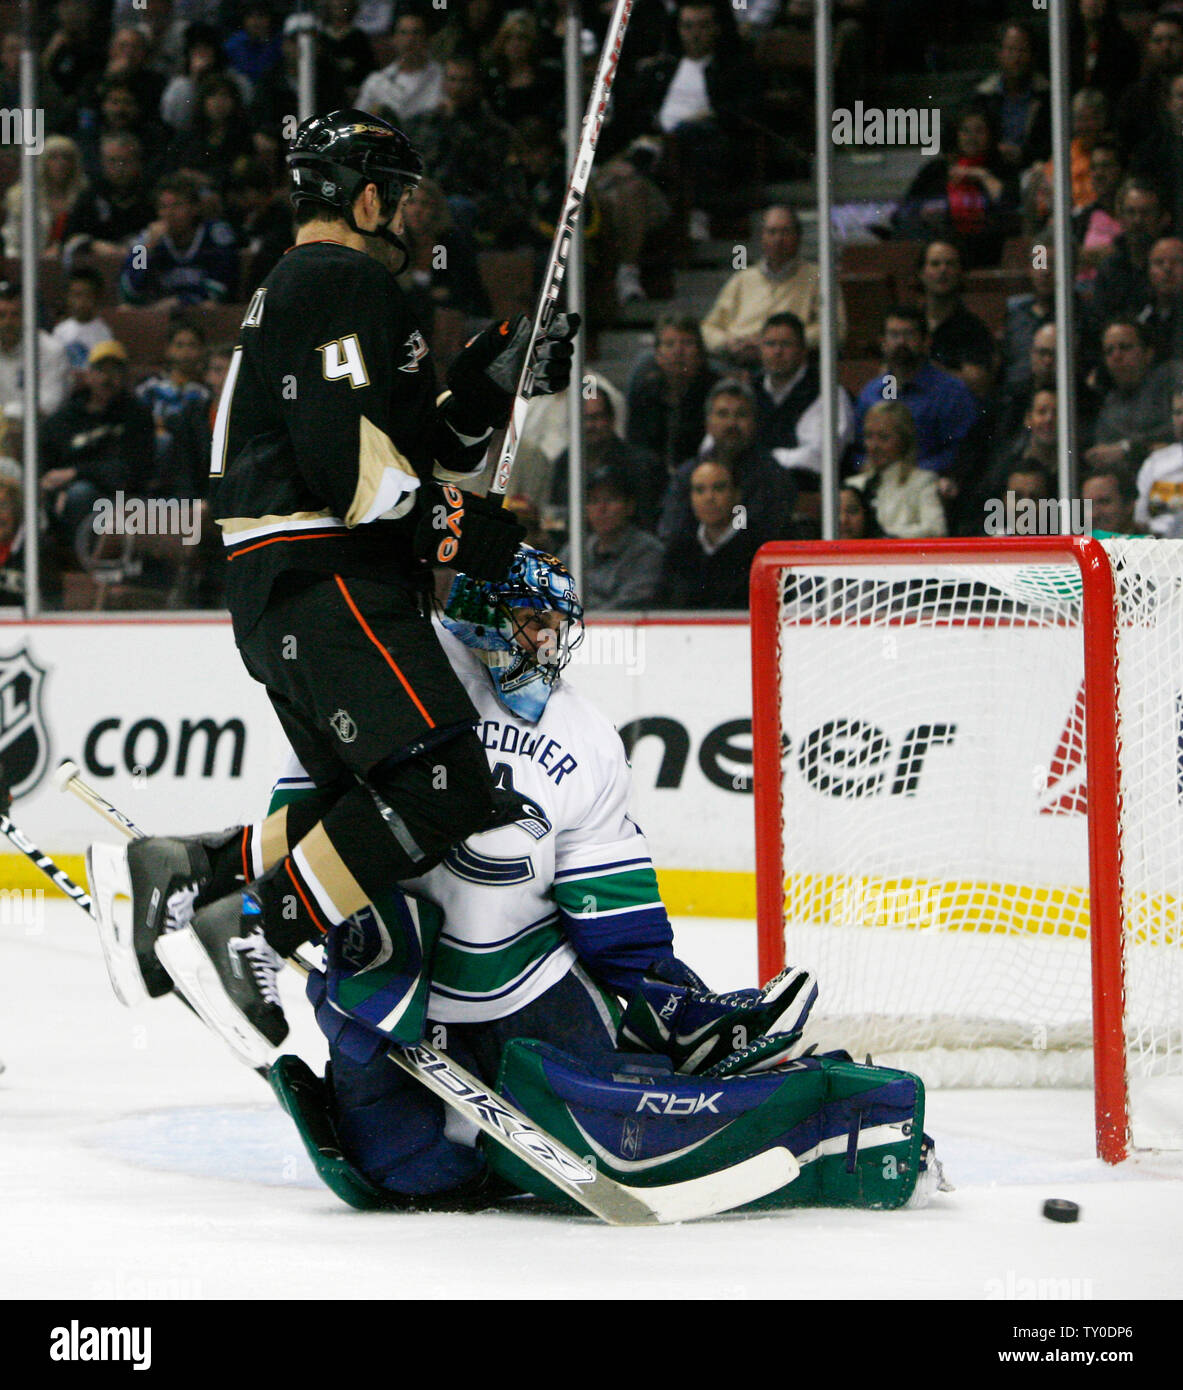 Anaheim Ducks Right Winger Todd Bertuzzi Leaps And Crashes Into